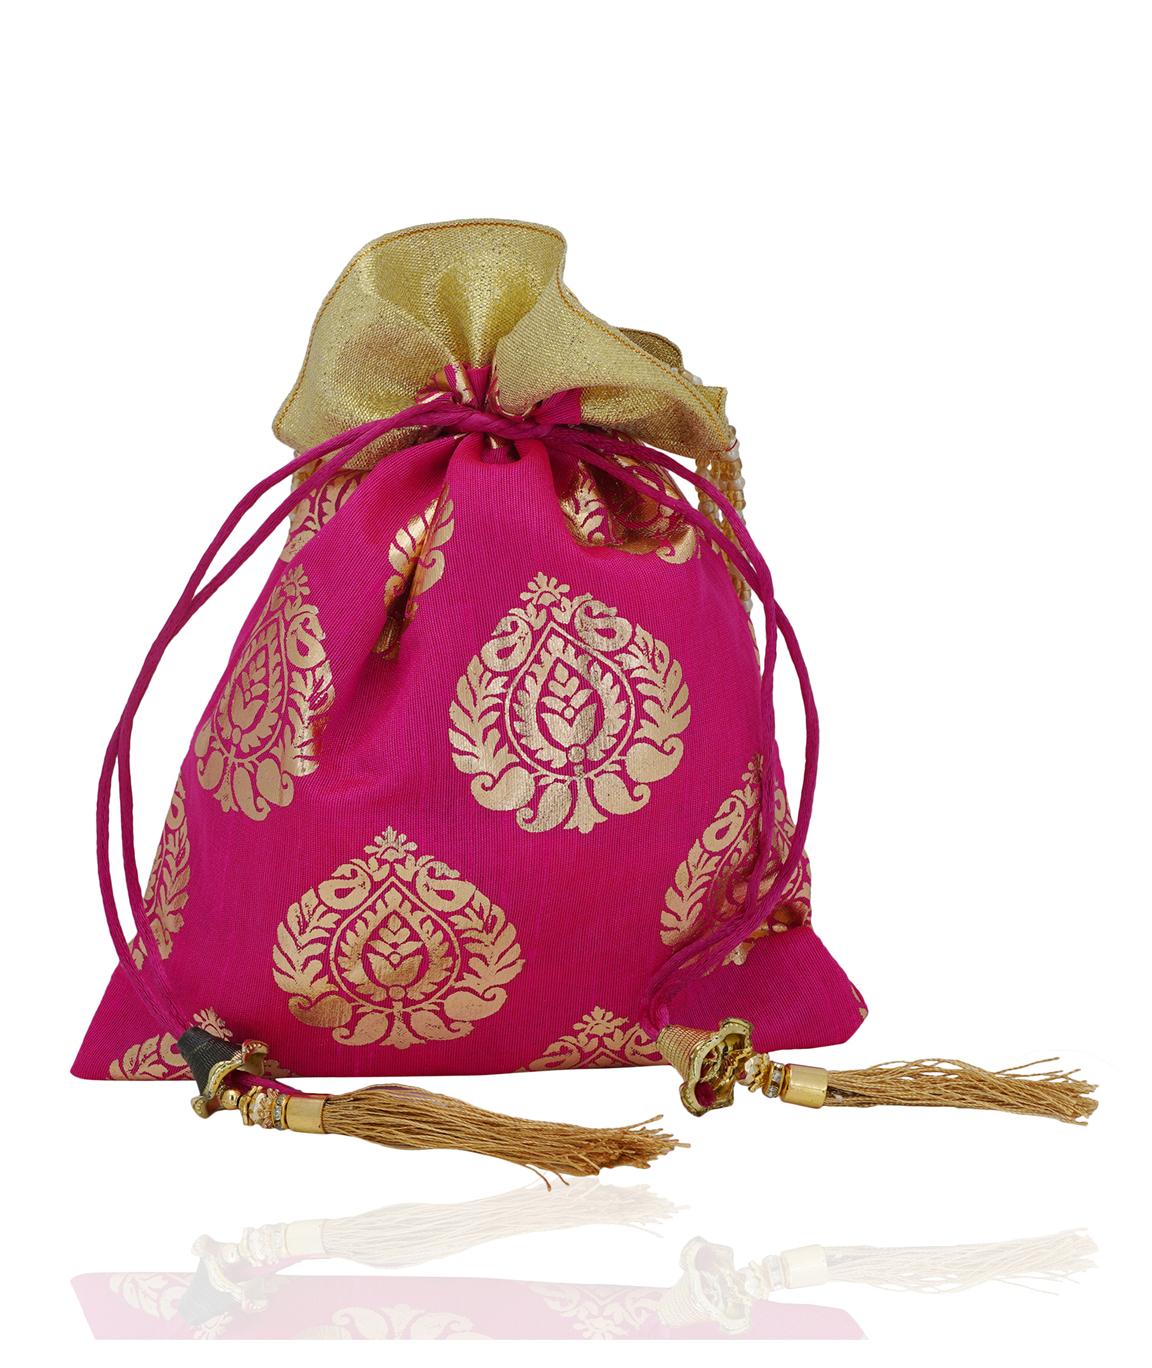 Pink Foil Print Dupion Silk Potli Bag With Golden Tassels(COLOUR : PINK)